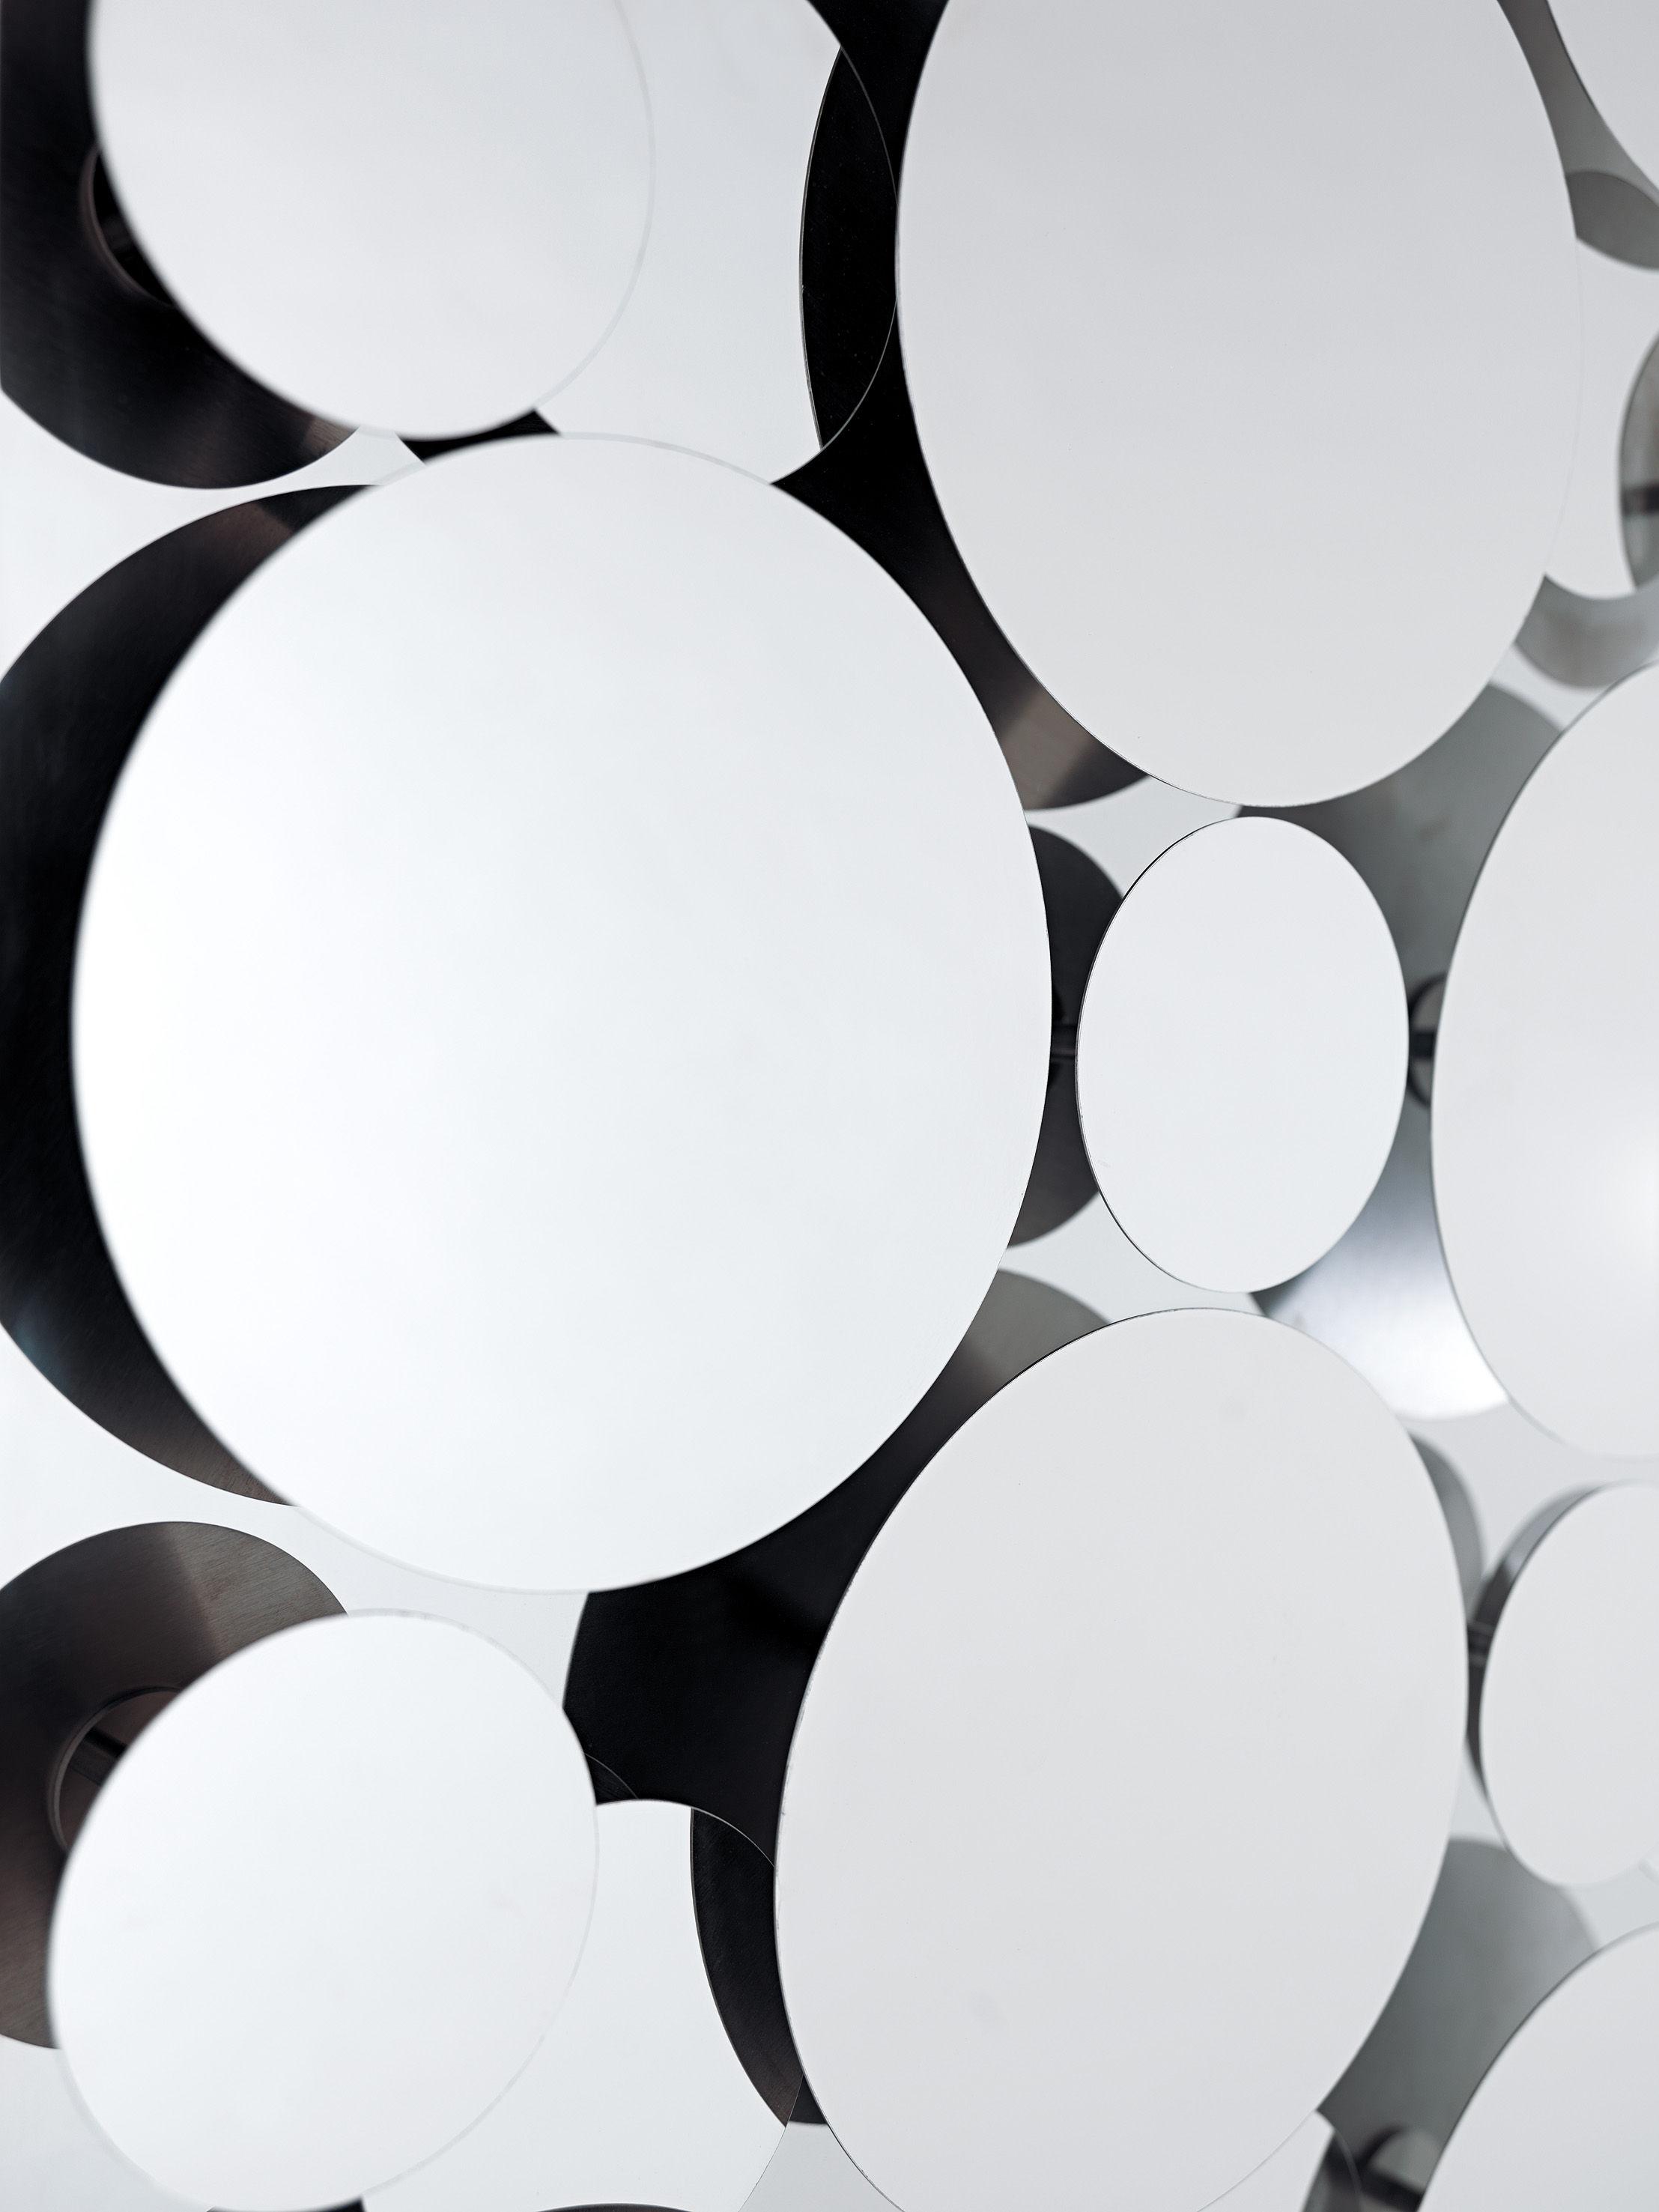 Miroir mural gag 90 x 58 cm acier poli opinion ciatti for Miroir 110 x 90